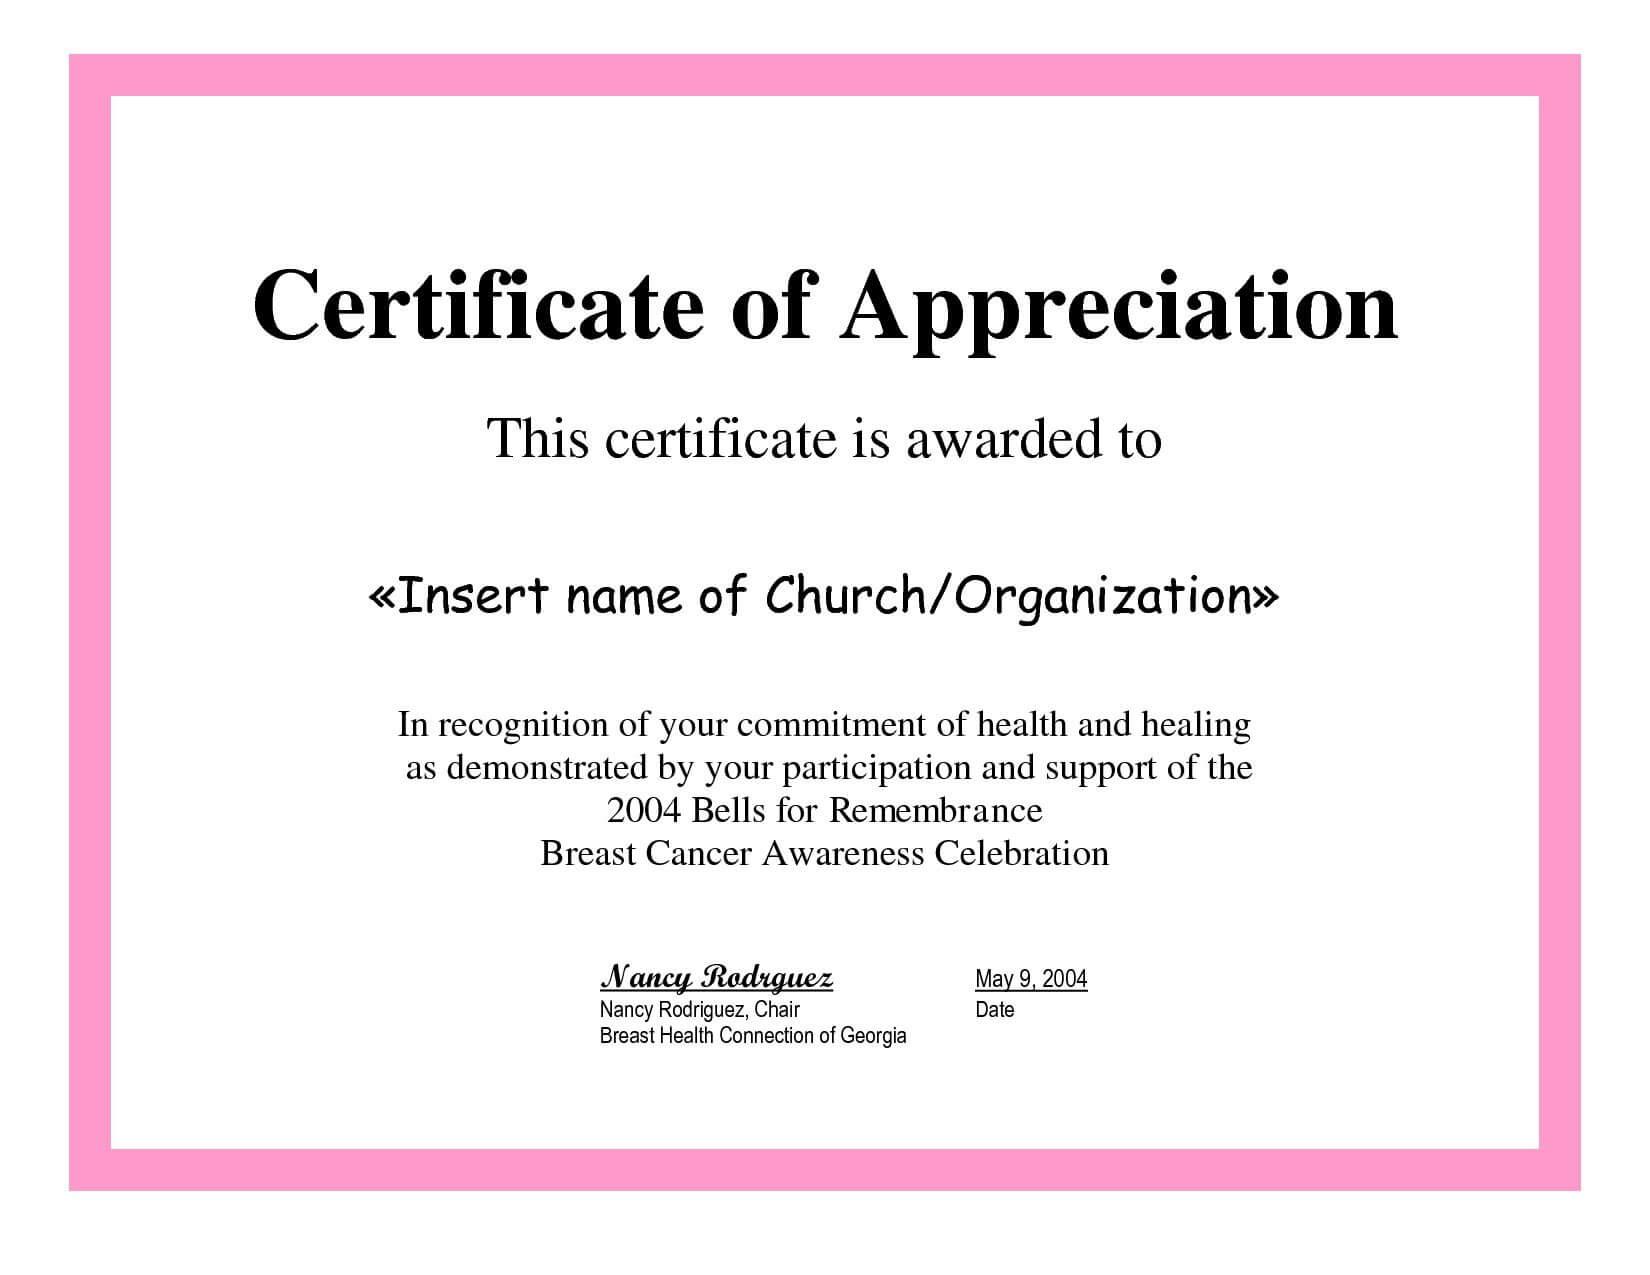 Employee Appreciation Certificate Template Free Recognition Regarding Employee Recognition Certificates Templates Free